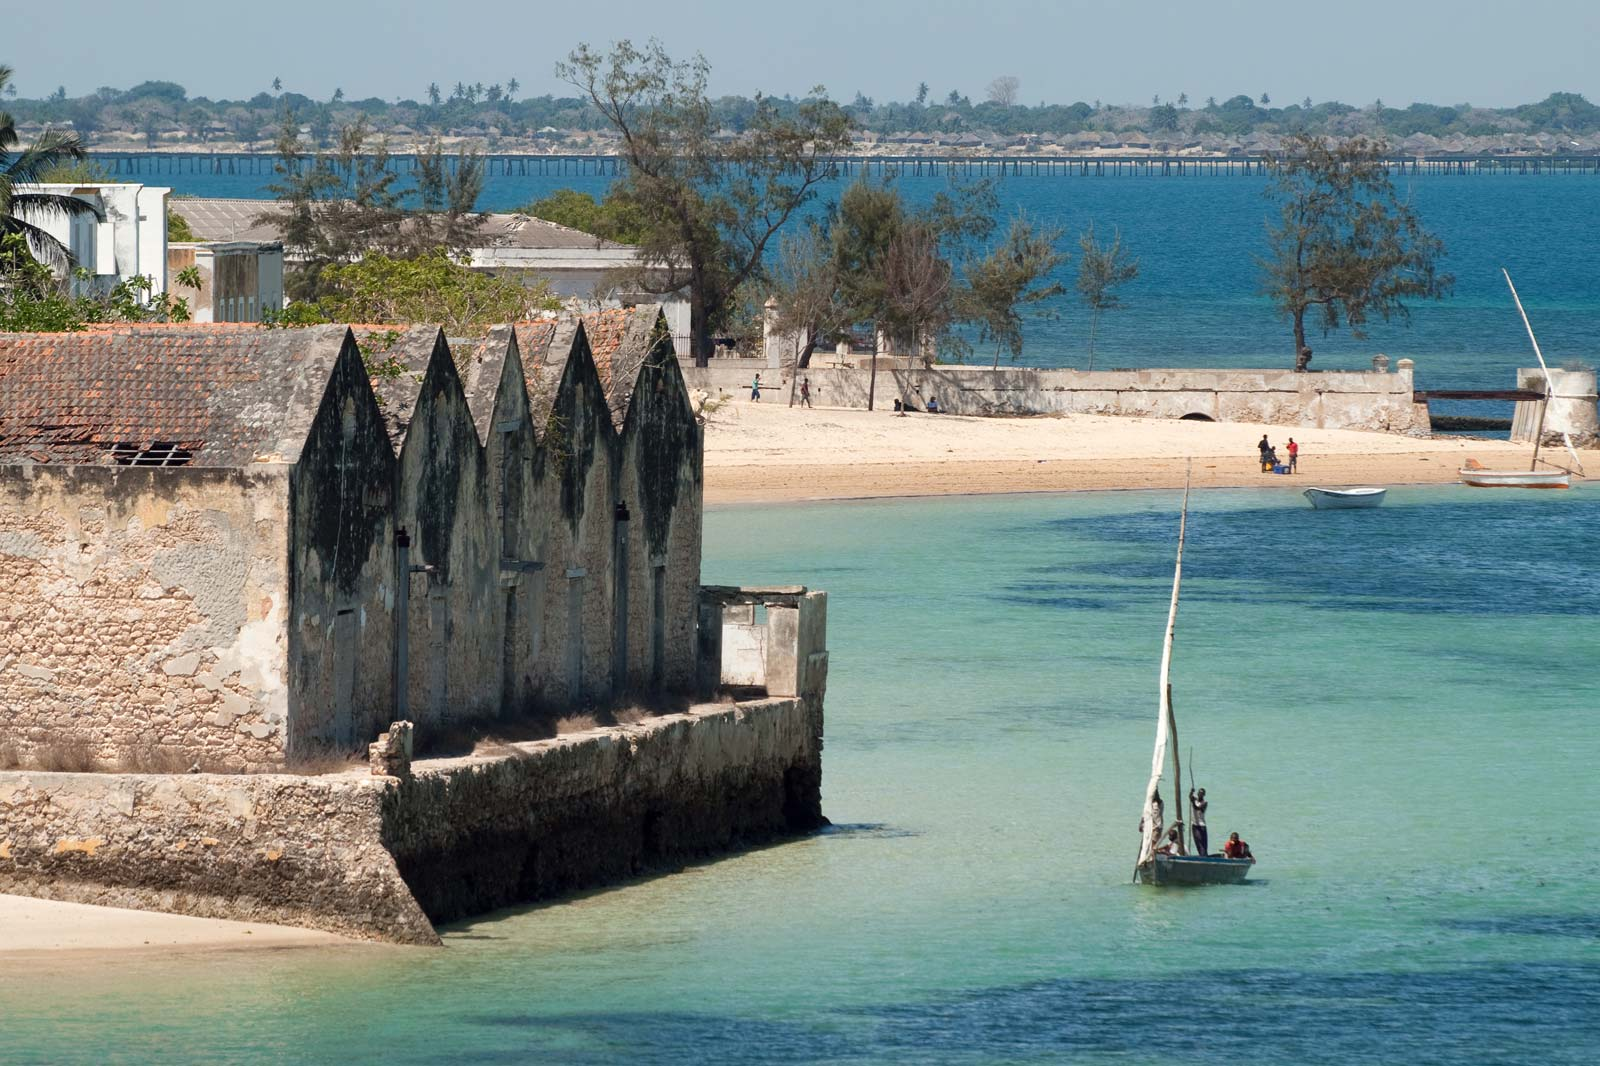 dhow-sailing-coast-Island-of-Mozambique